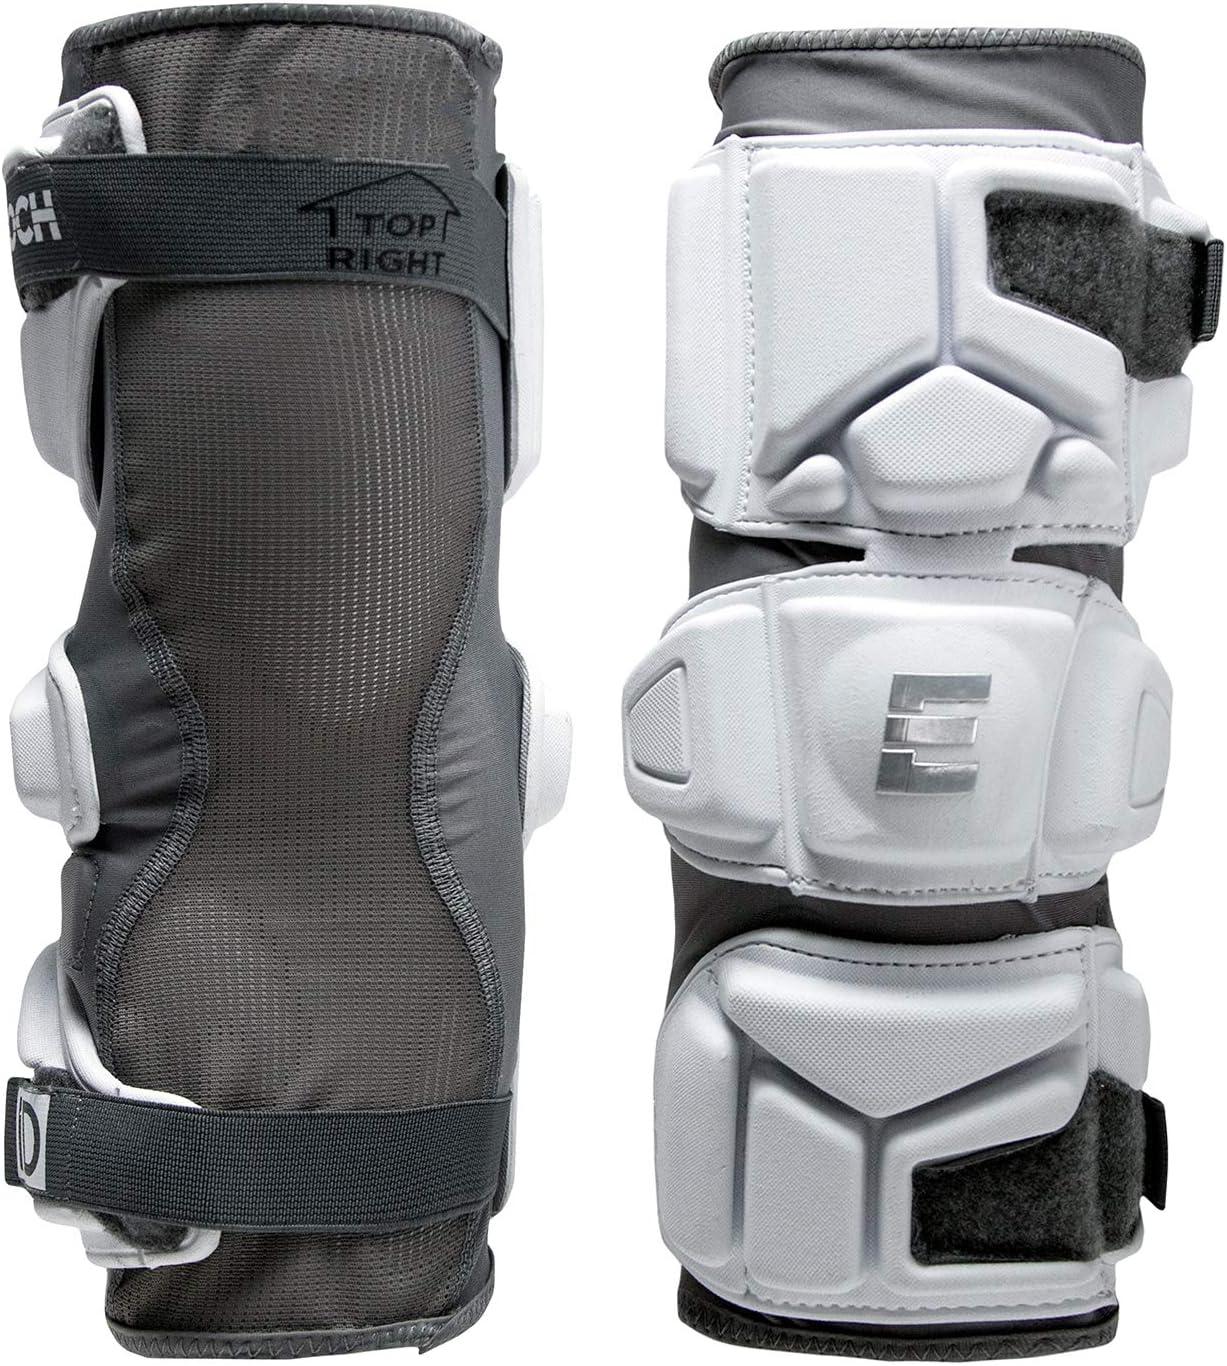 size L New Lacrosse-LAX ARM PADS by GAIT//DEBEER Intrepid series